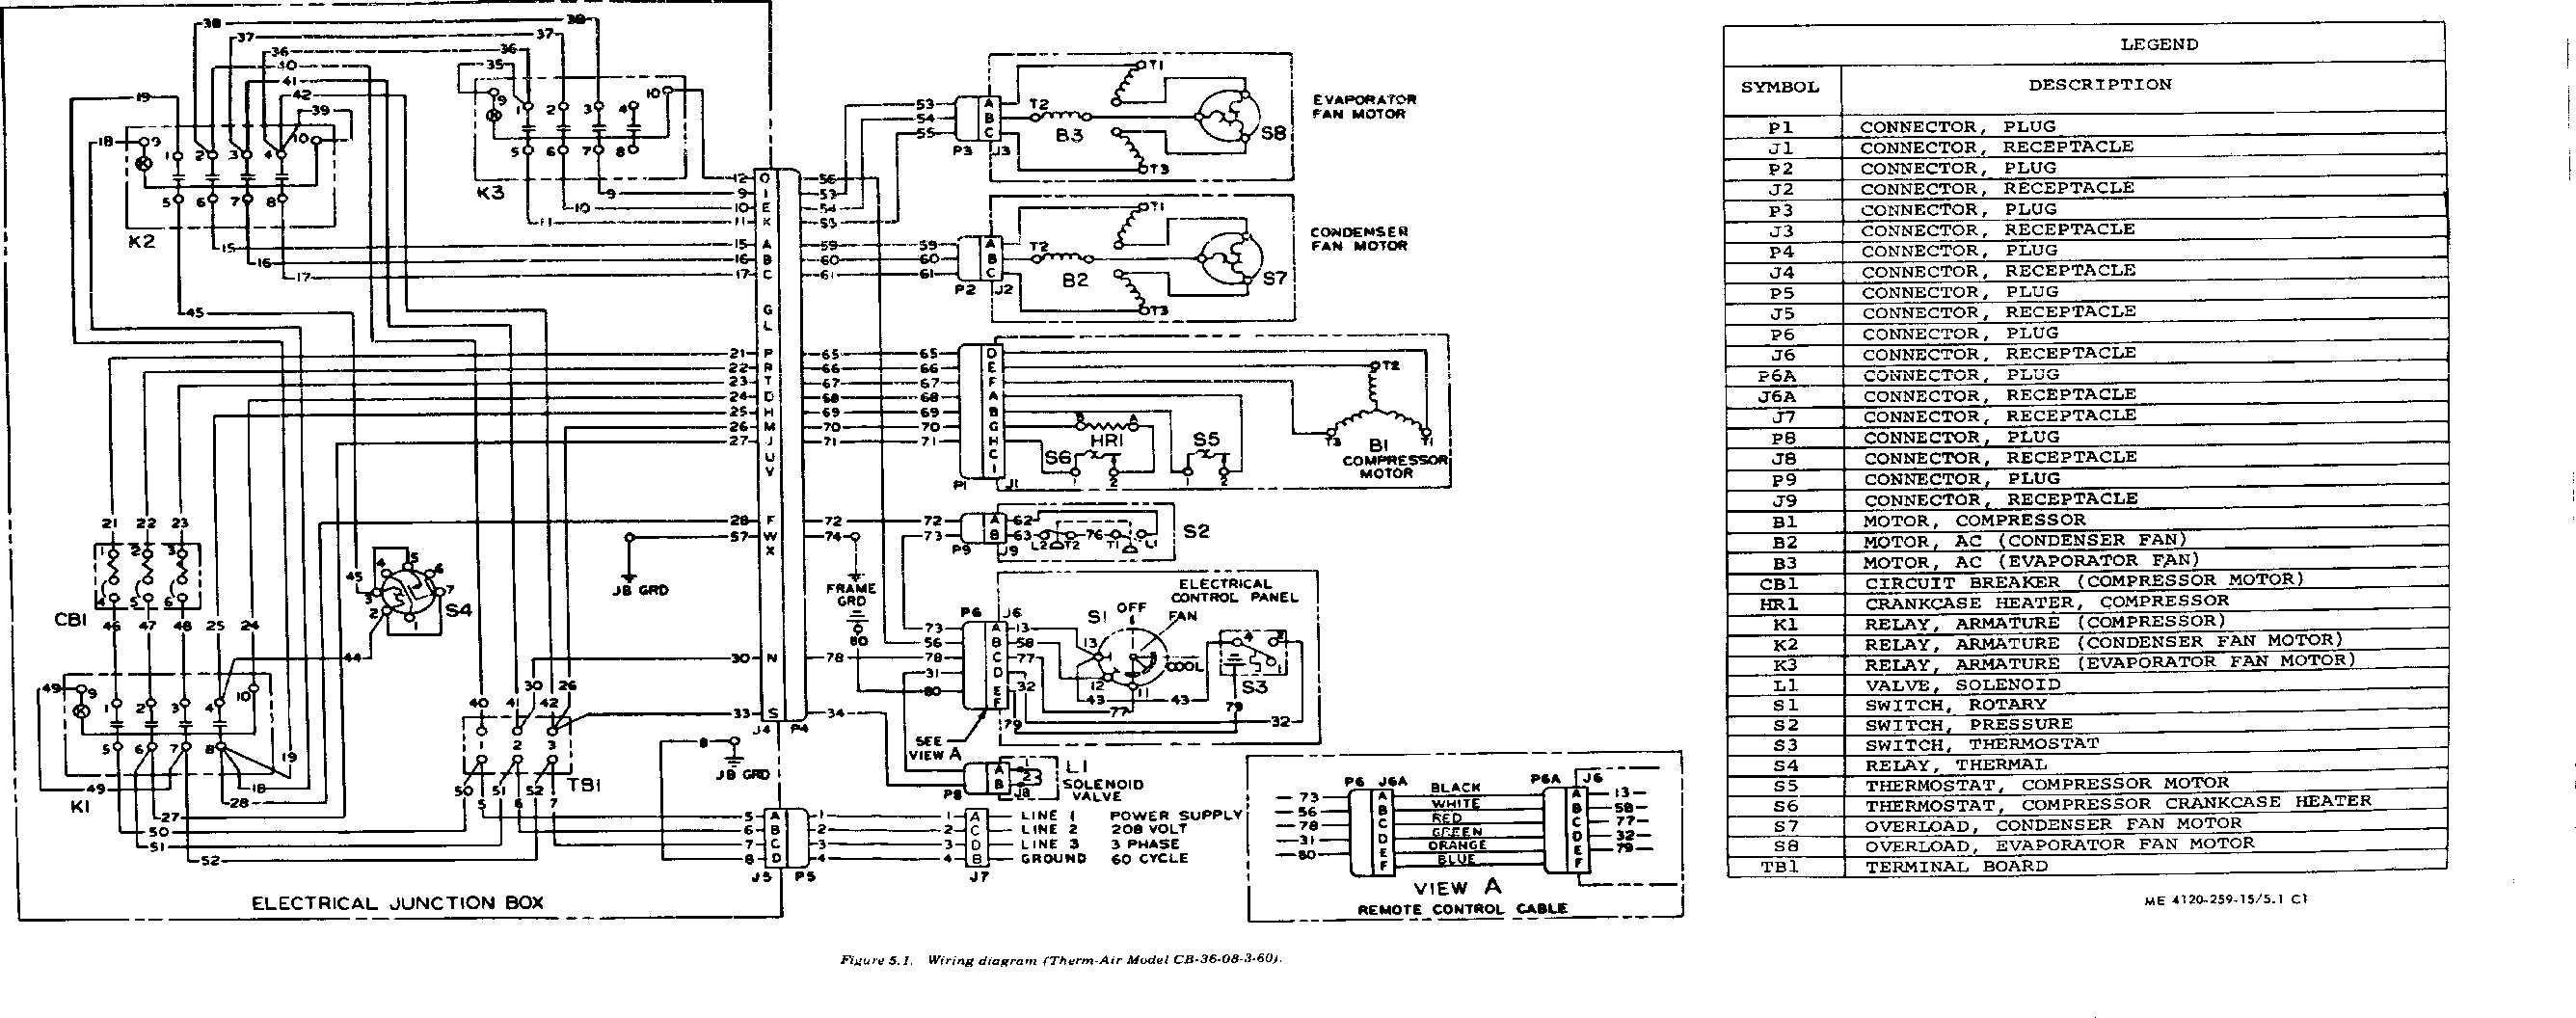 trane xe 1200 heat pump wiring diagram control4 diagrams xl1200 my